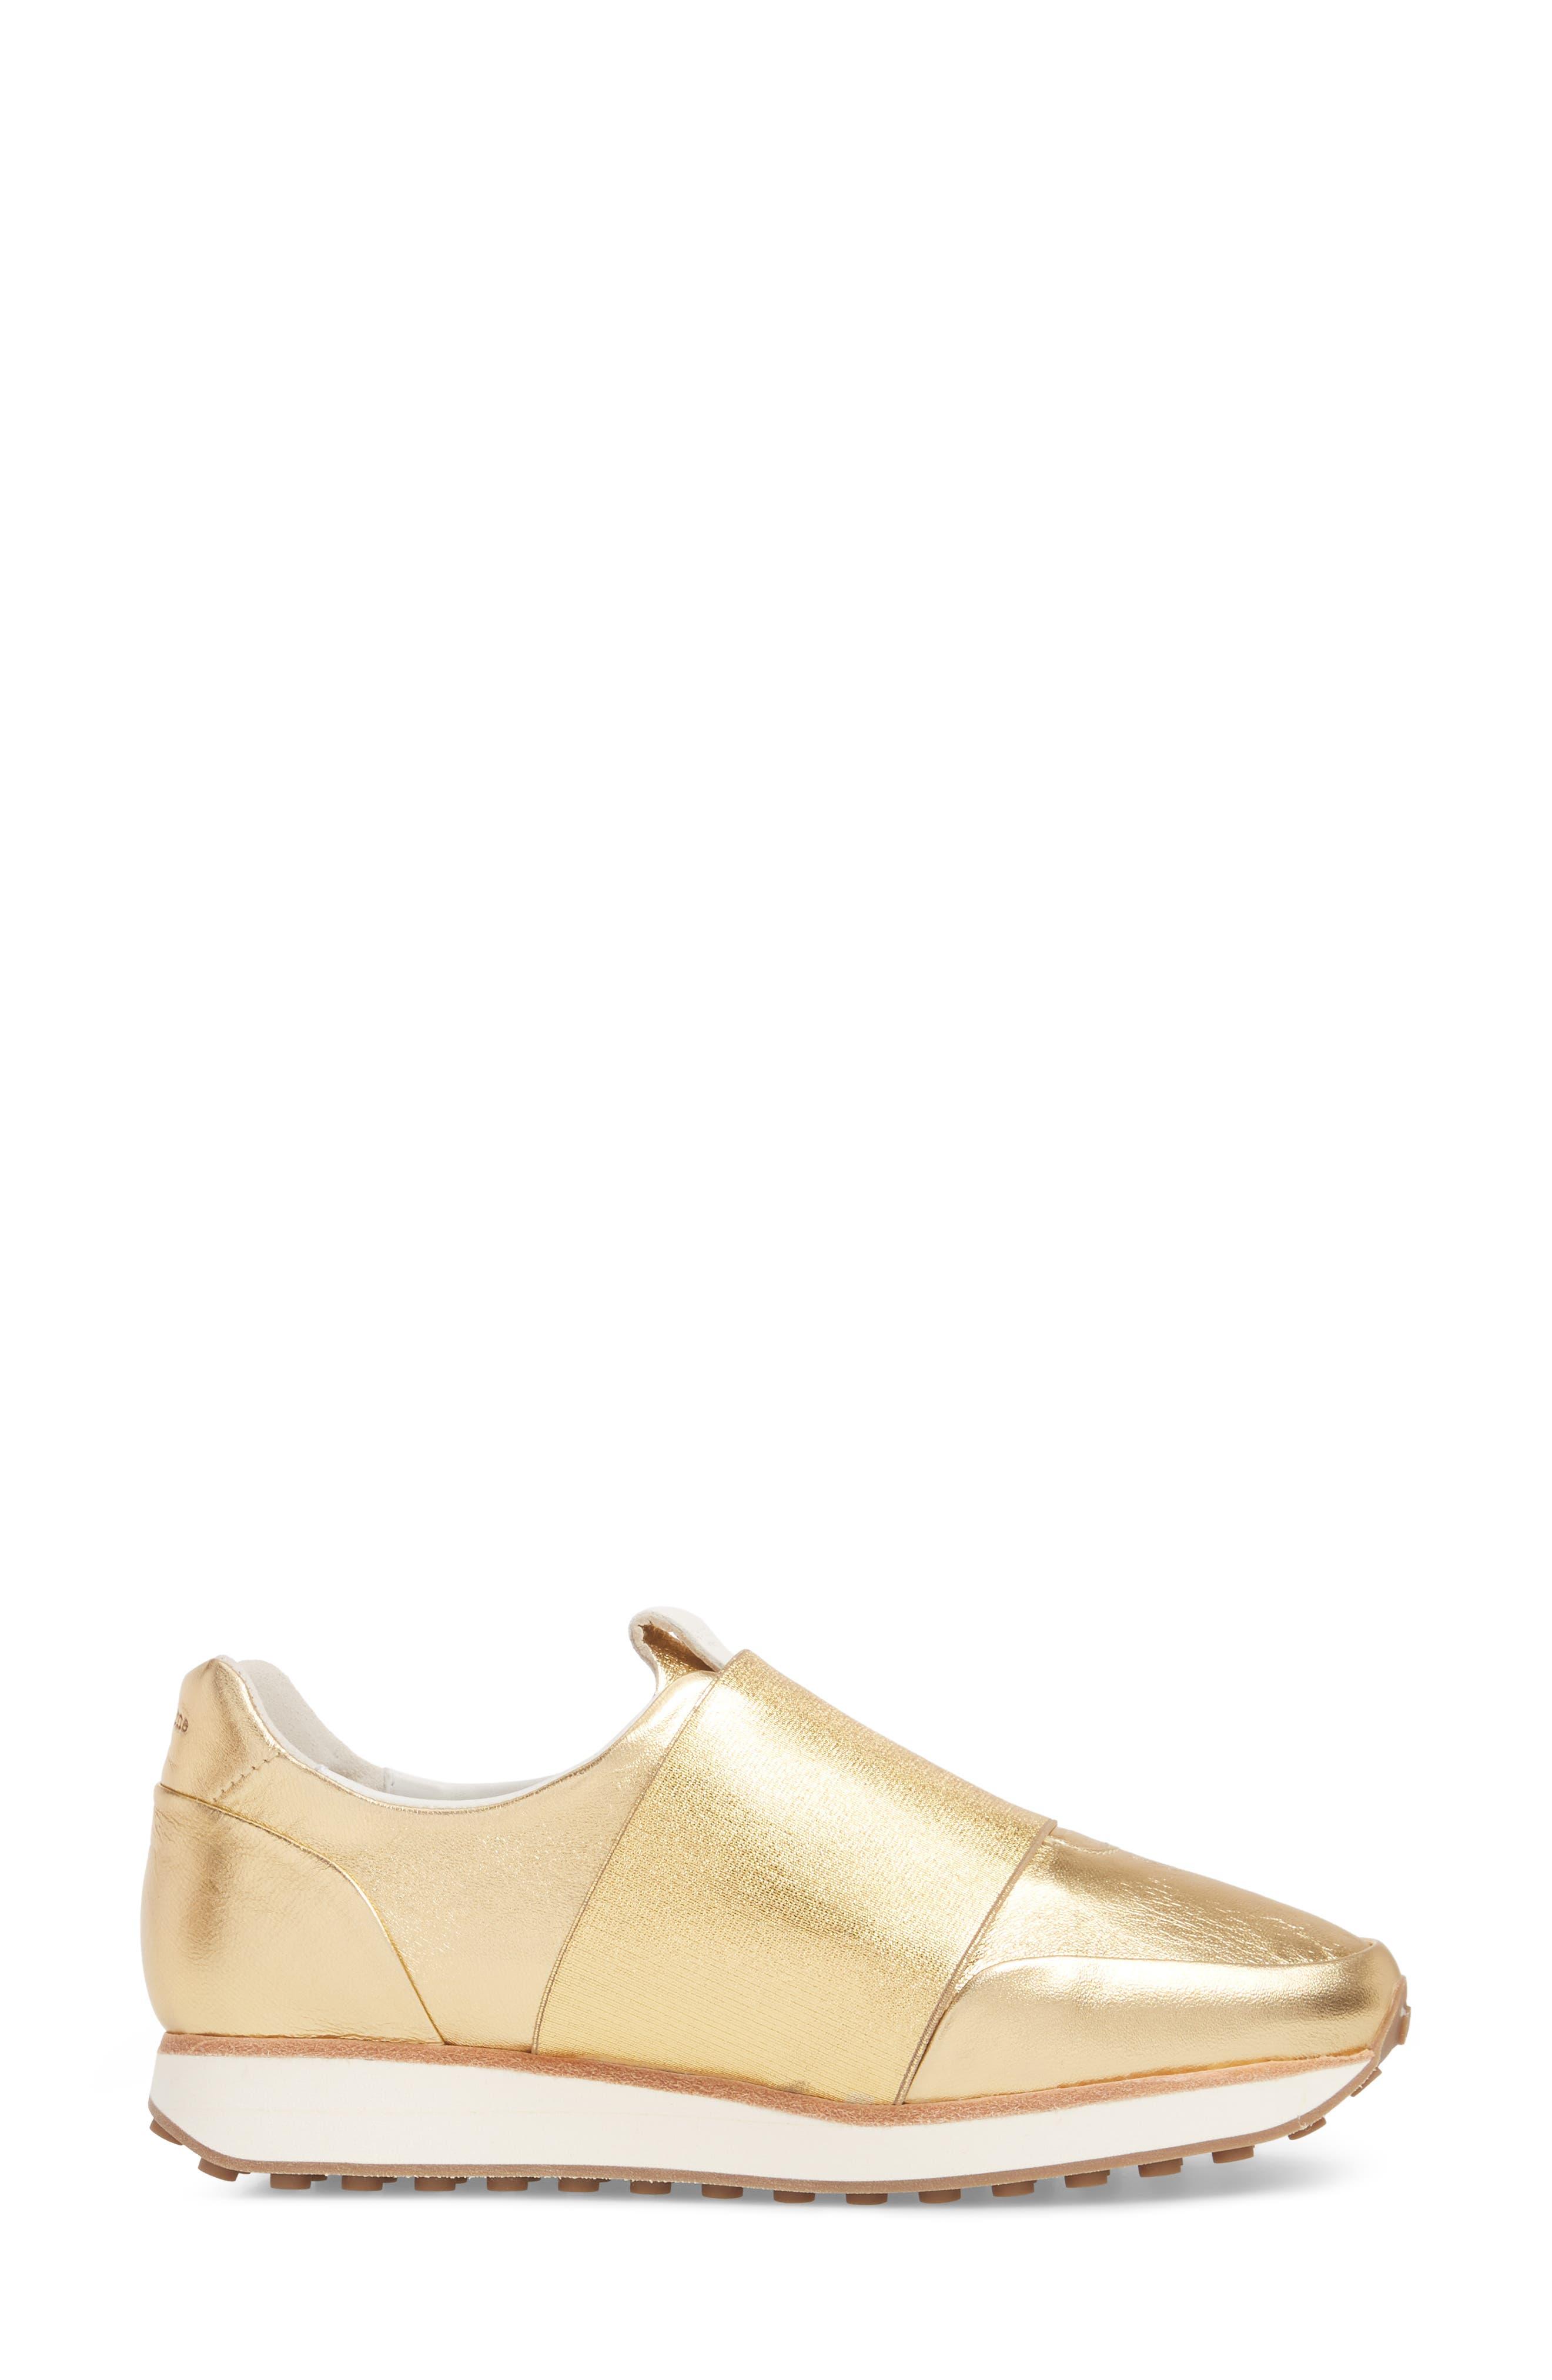 Dylan Sneaker,                             Alternate thumbnail 3, color,                             Gold